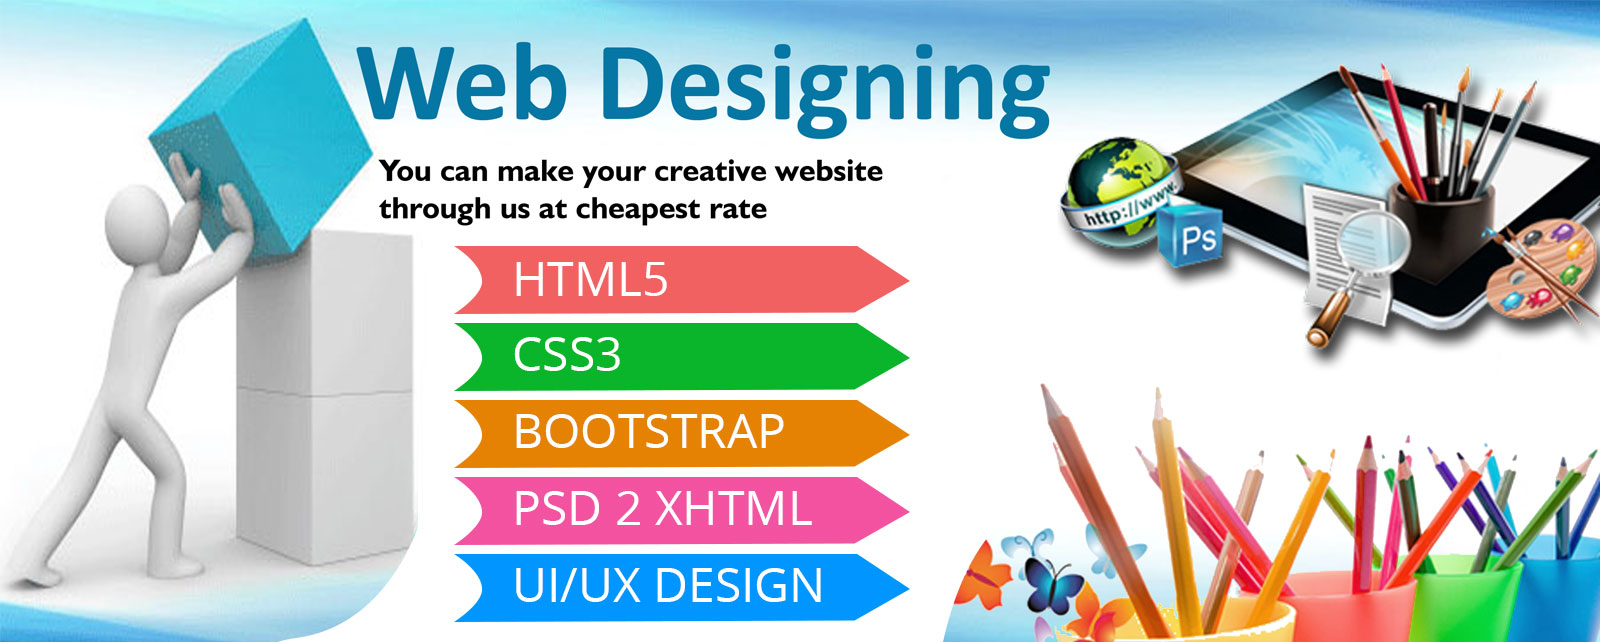 website design & development company in delhi  maya techno soft